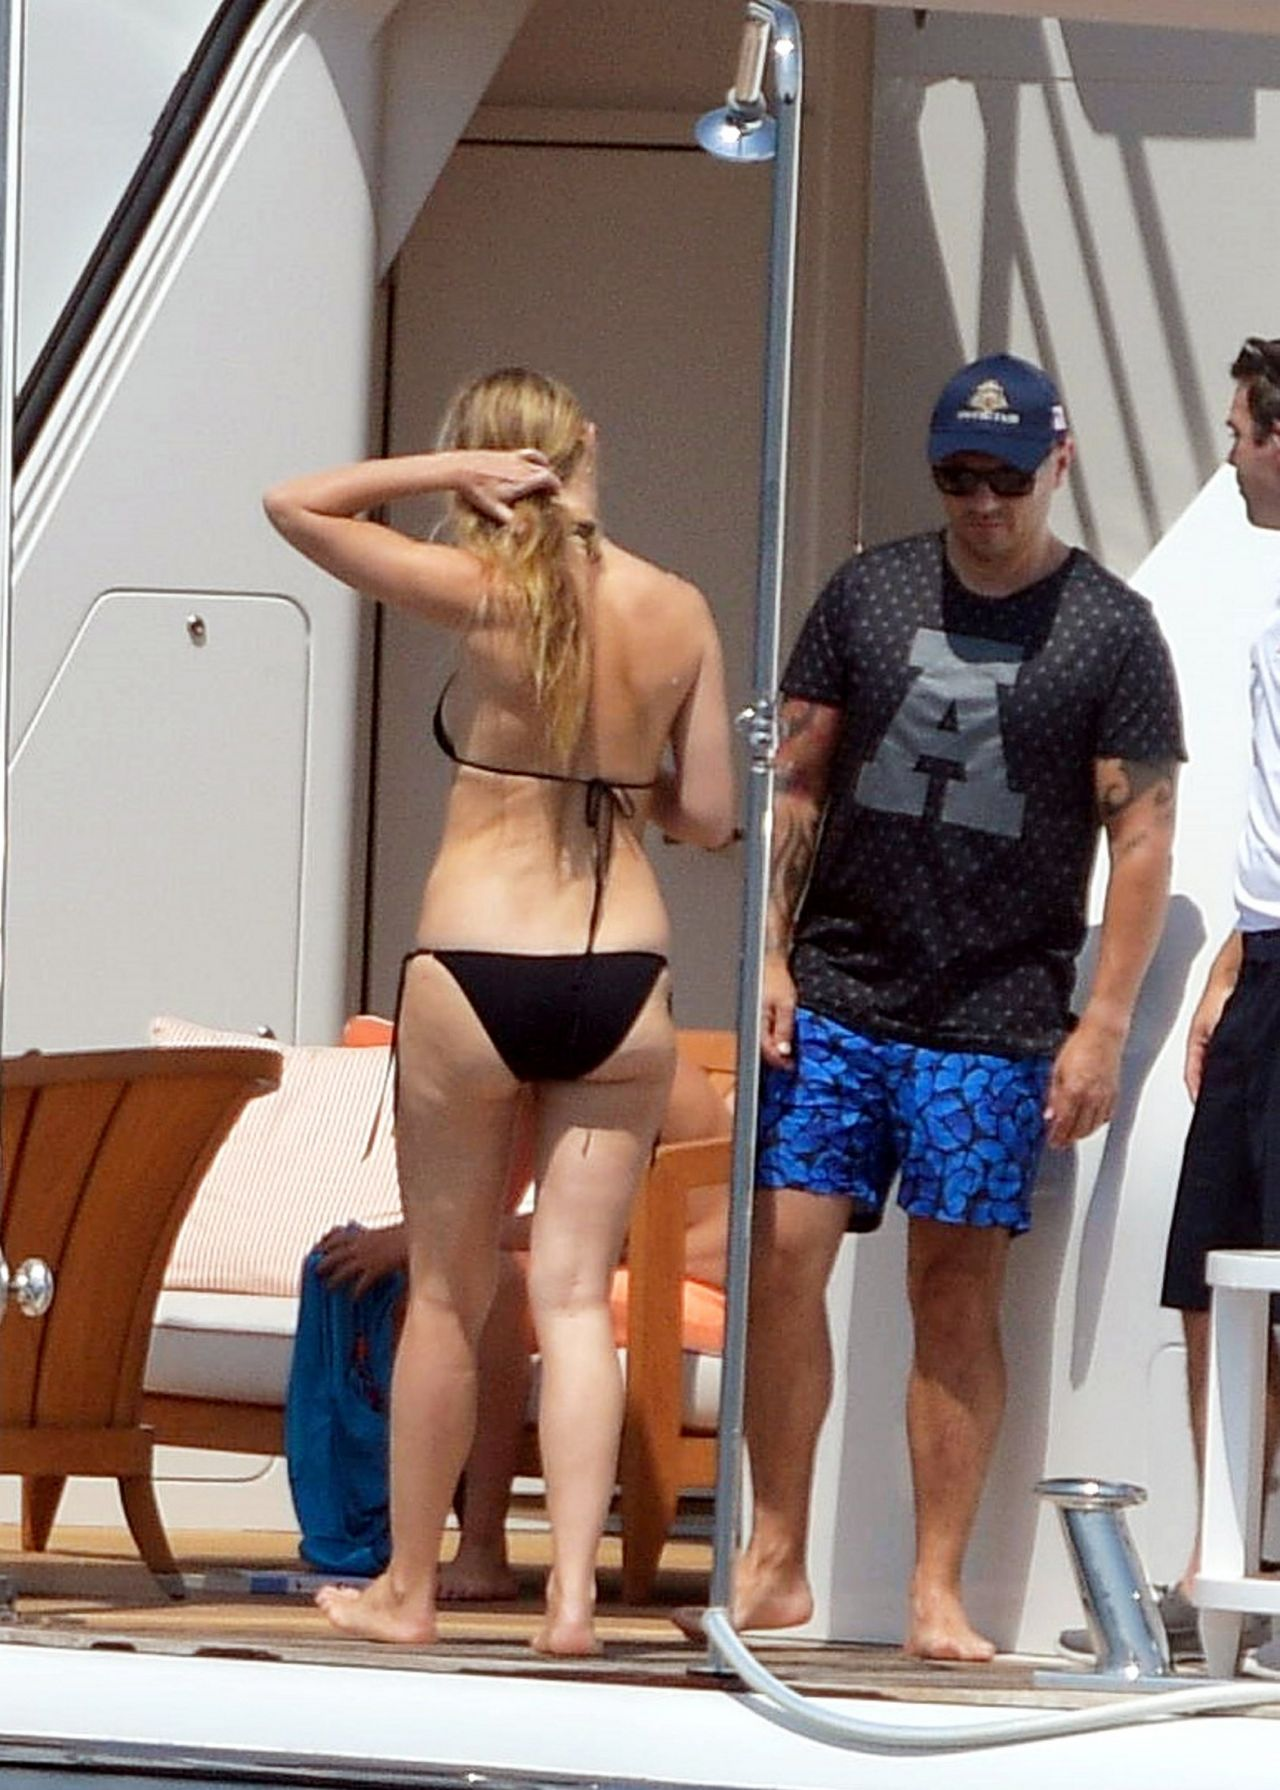 Gwyneth Paltrow In A Tiny Bikini St Tropez France 06 19